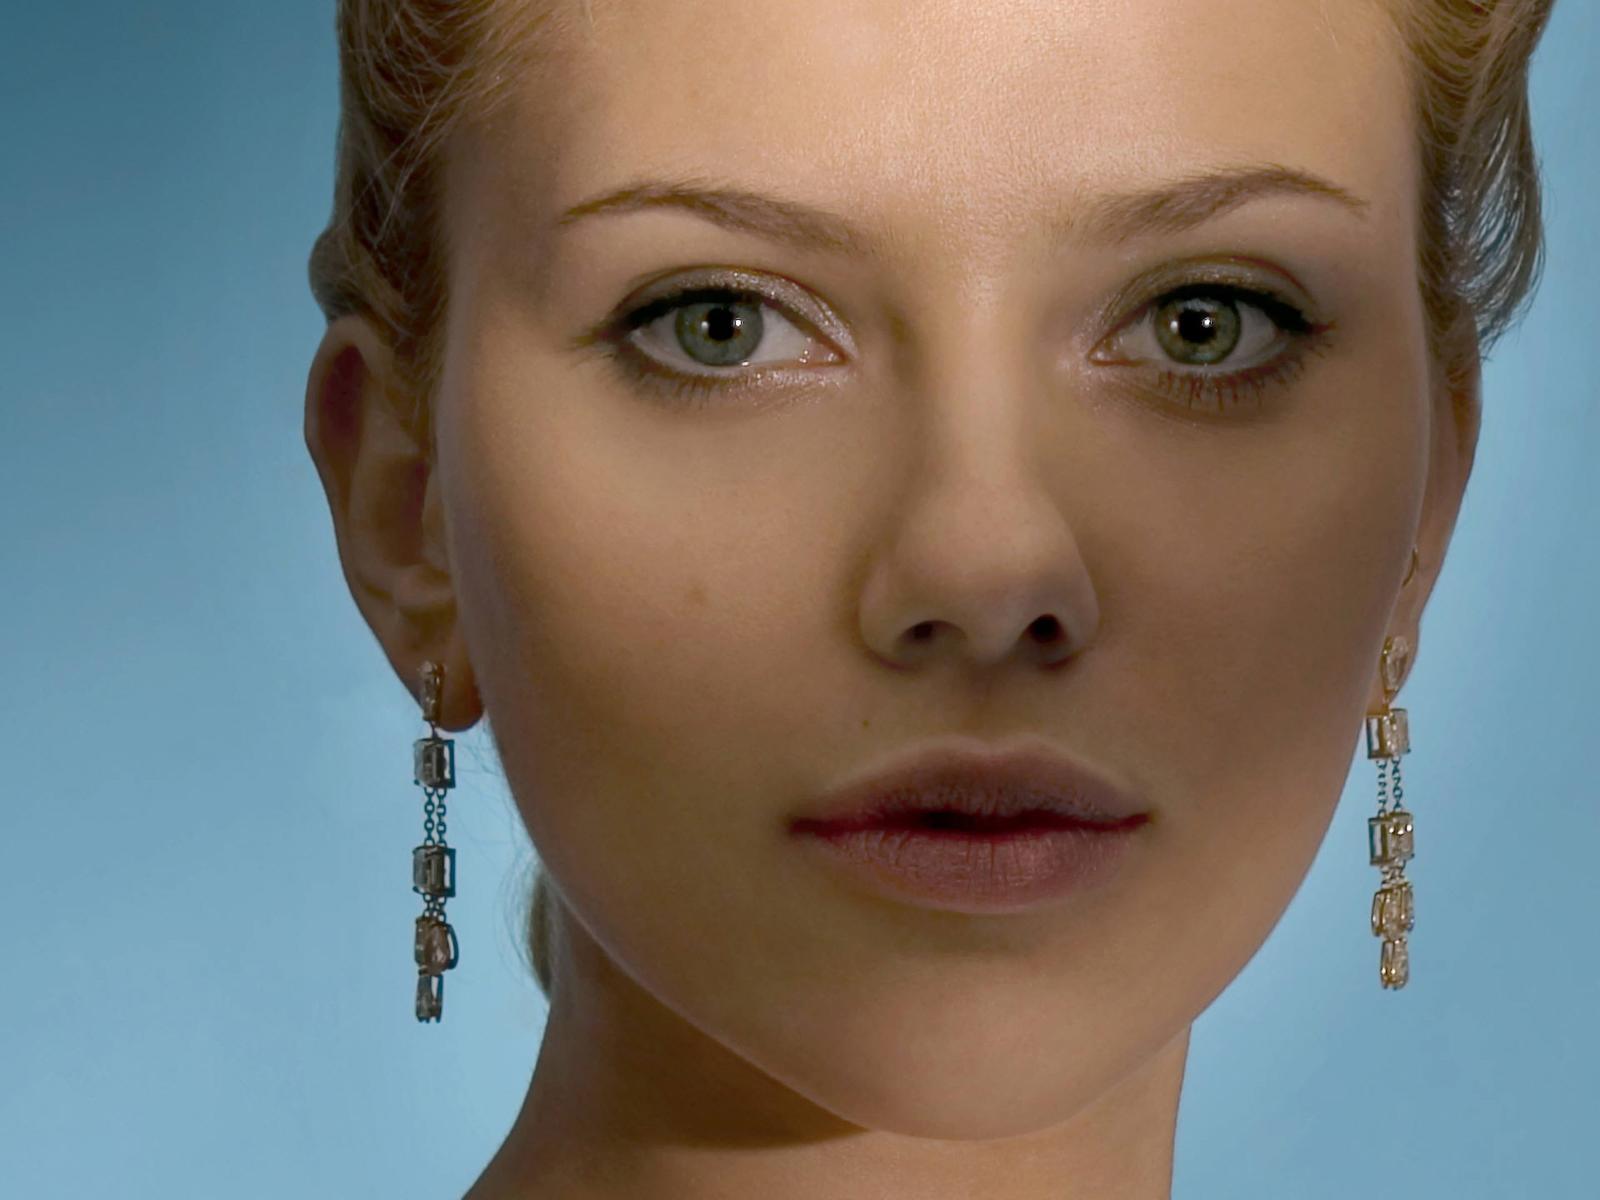 Scarlett Johansson Hollywood Glam Wallpaper Taste Wallpapers 1600x1200